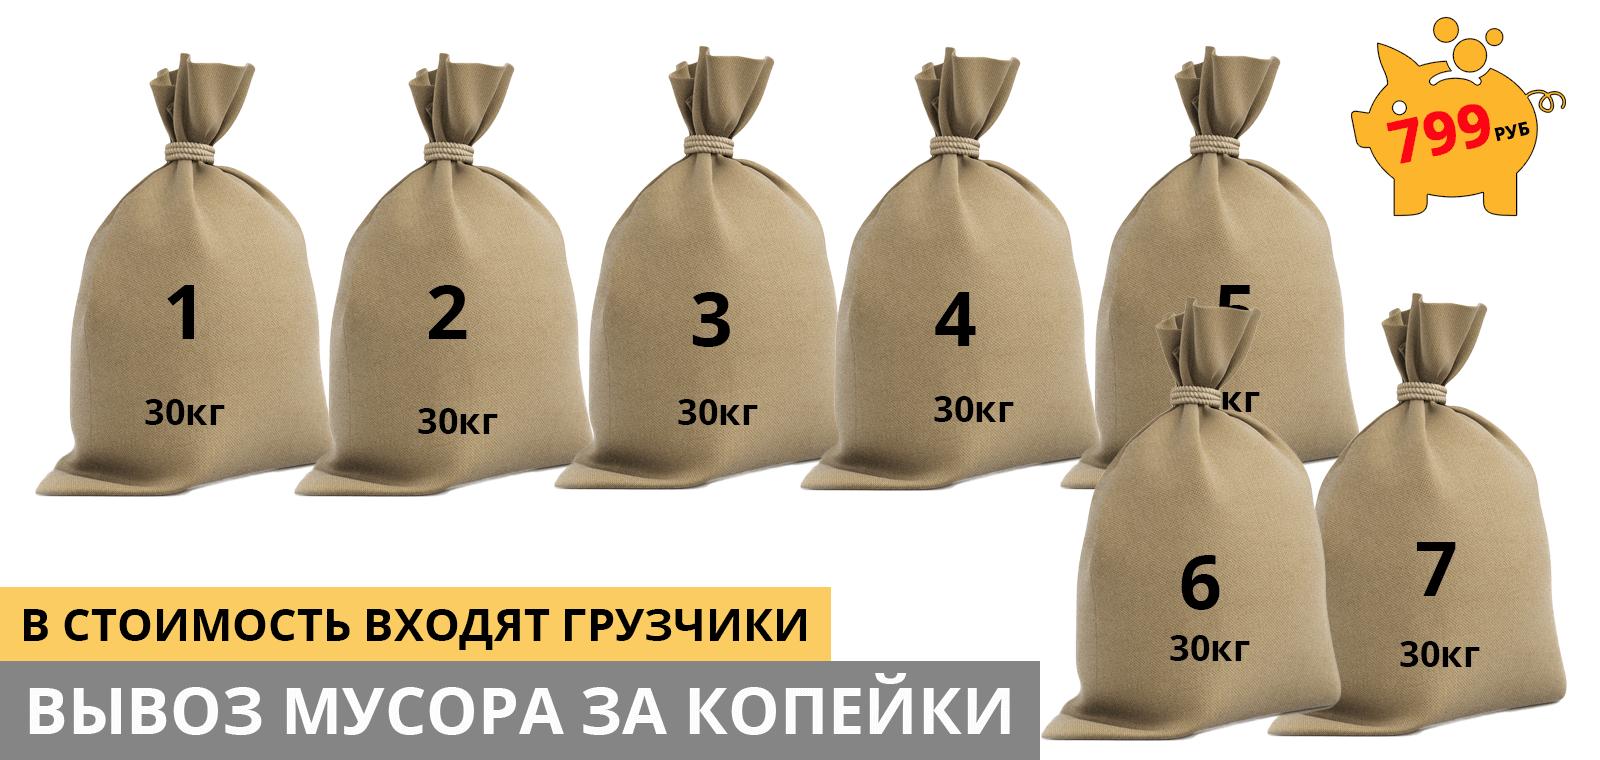 skidka_kopeyki_big-2